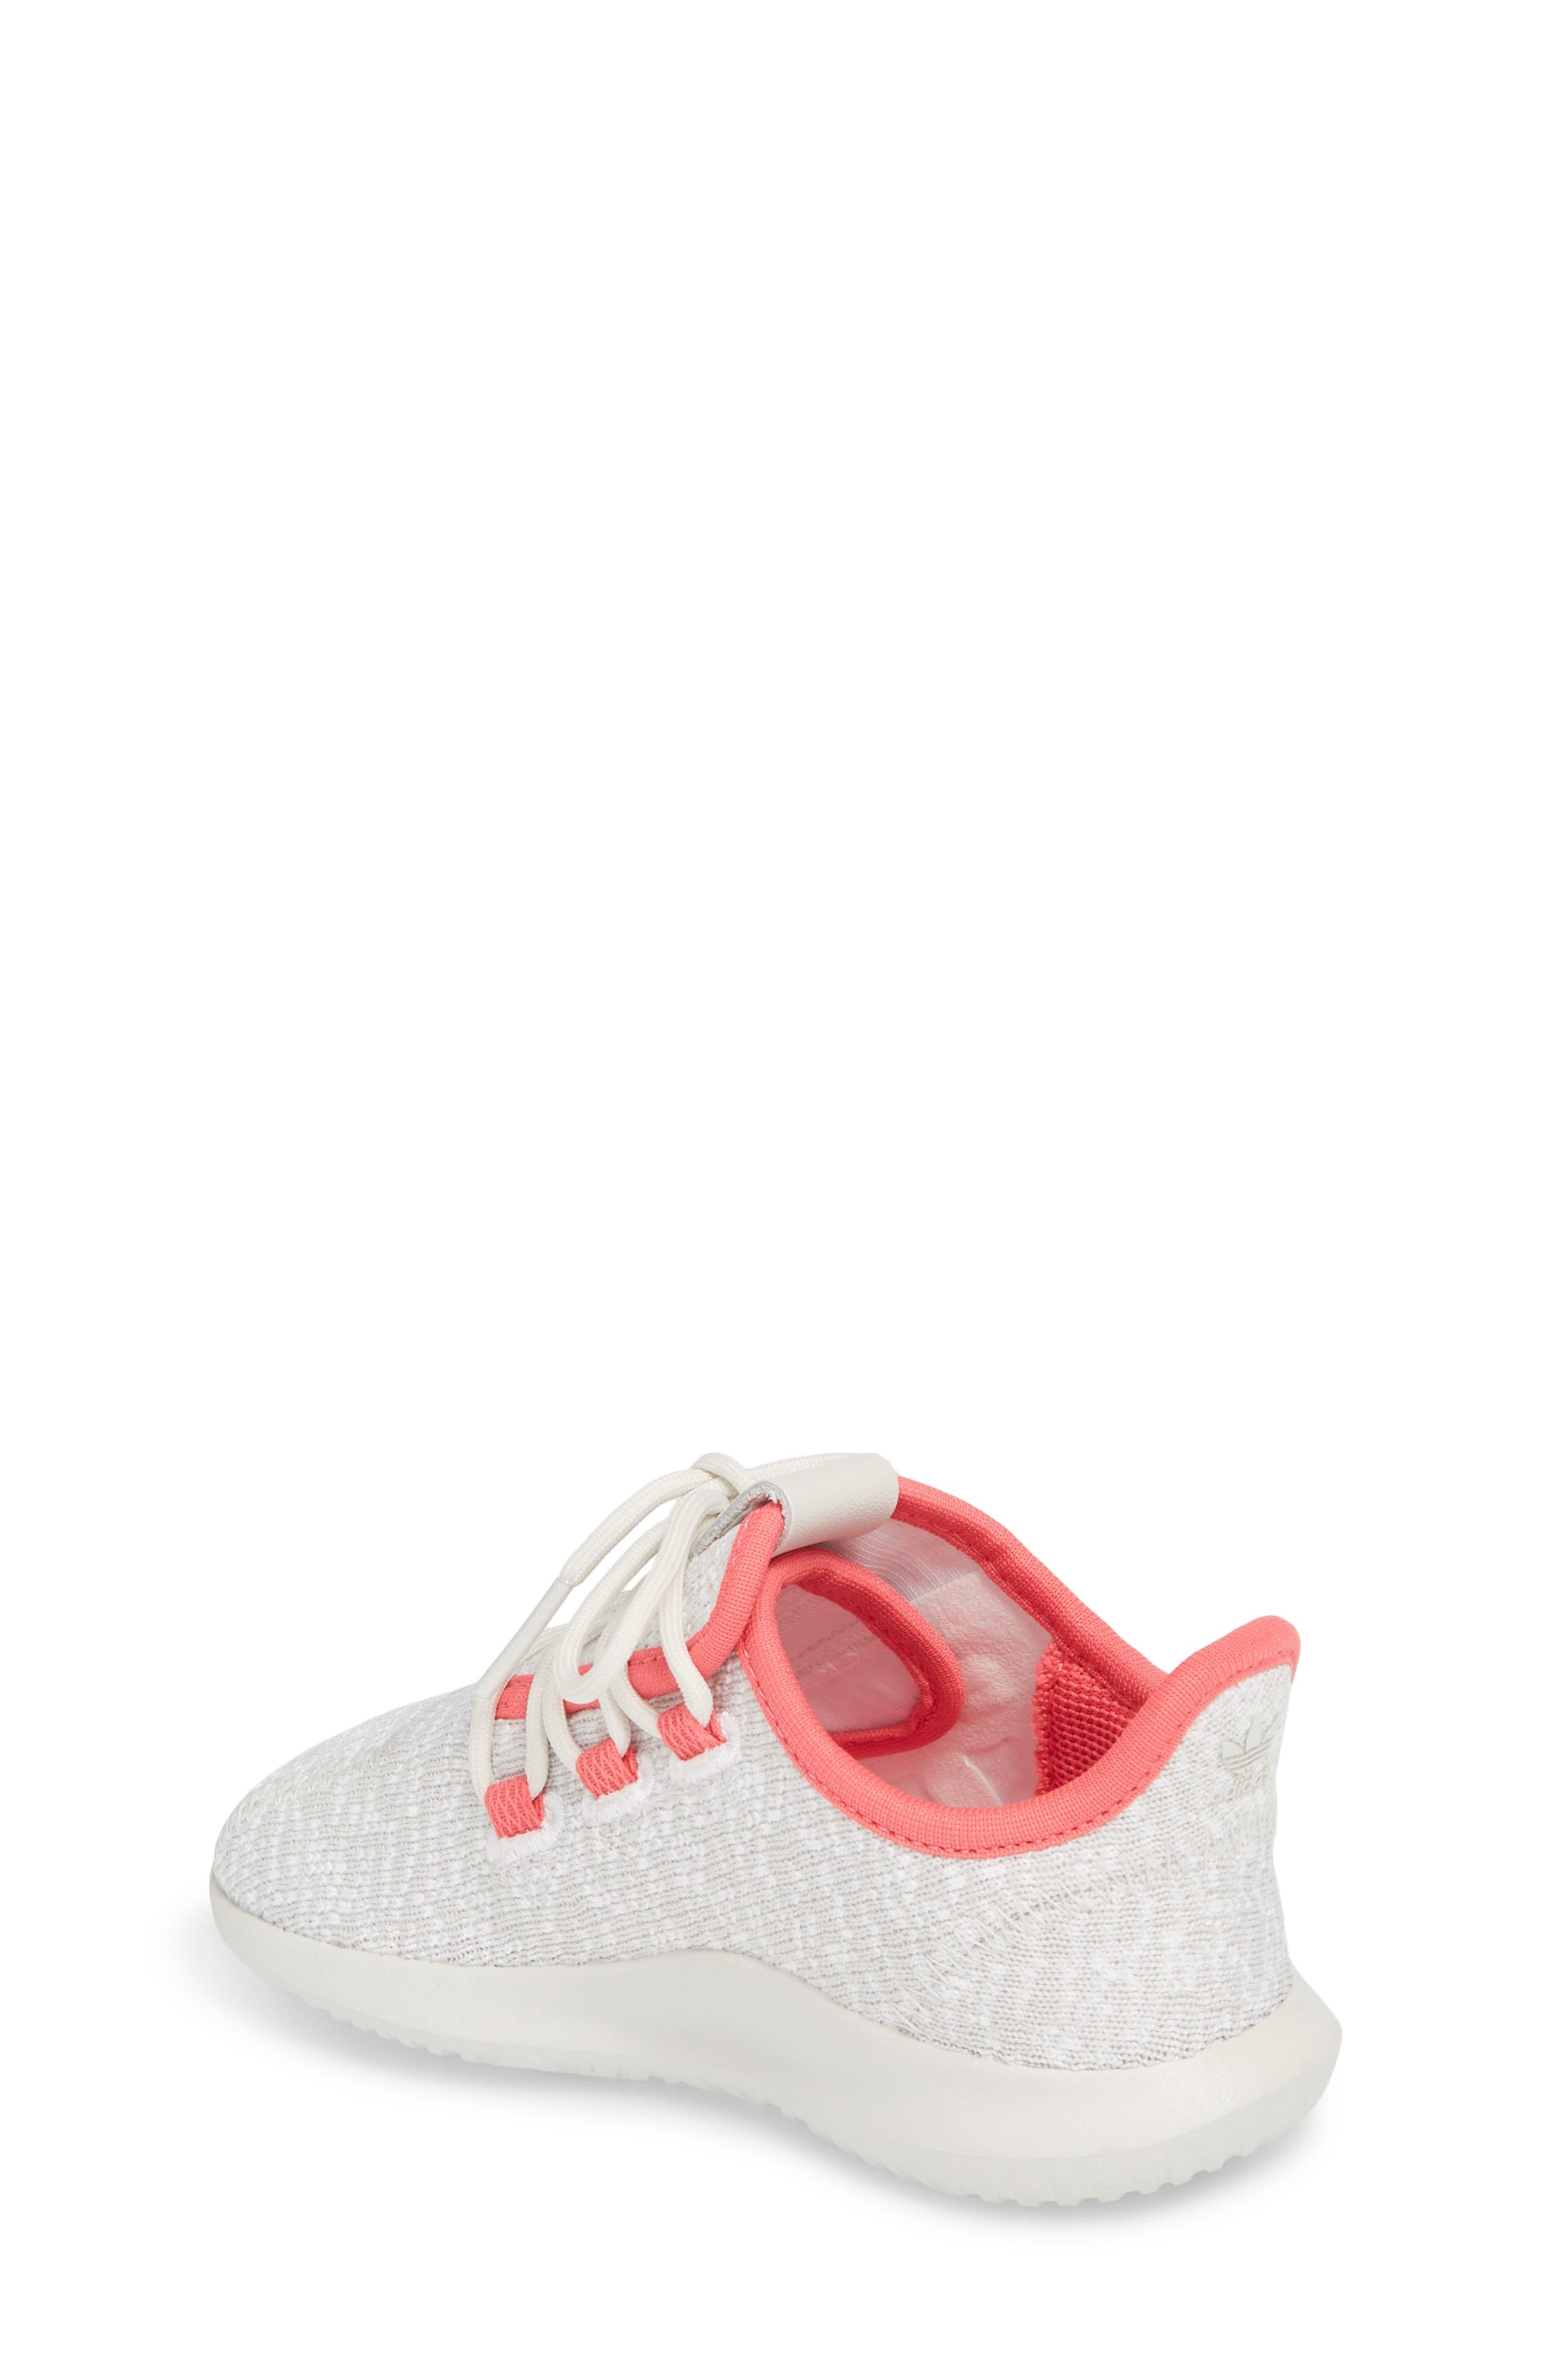 Tubular Shadow Sneaker,                             Alternate thumbnail 2, color,                             Grey/ Ash Pink/ White